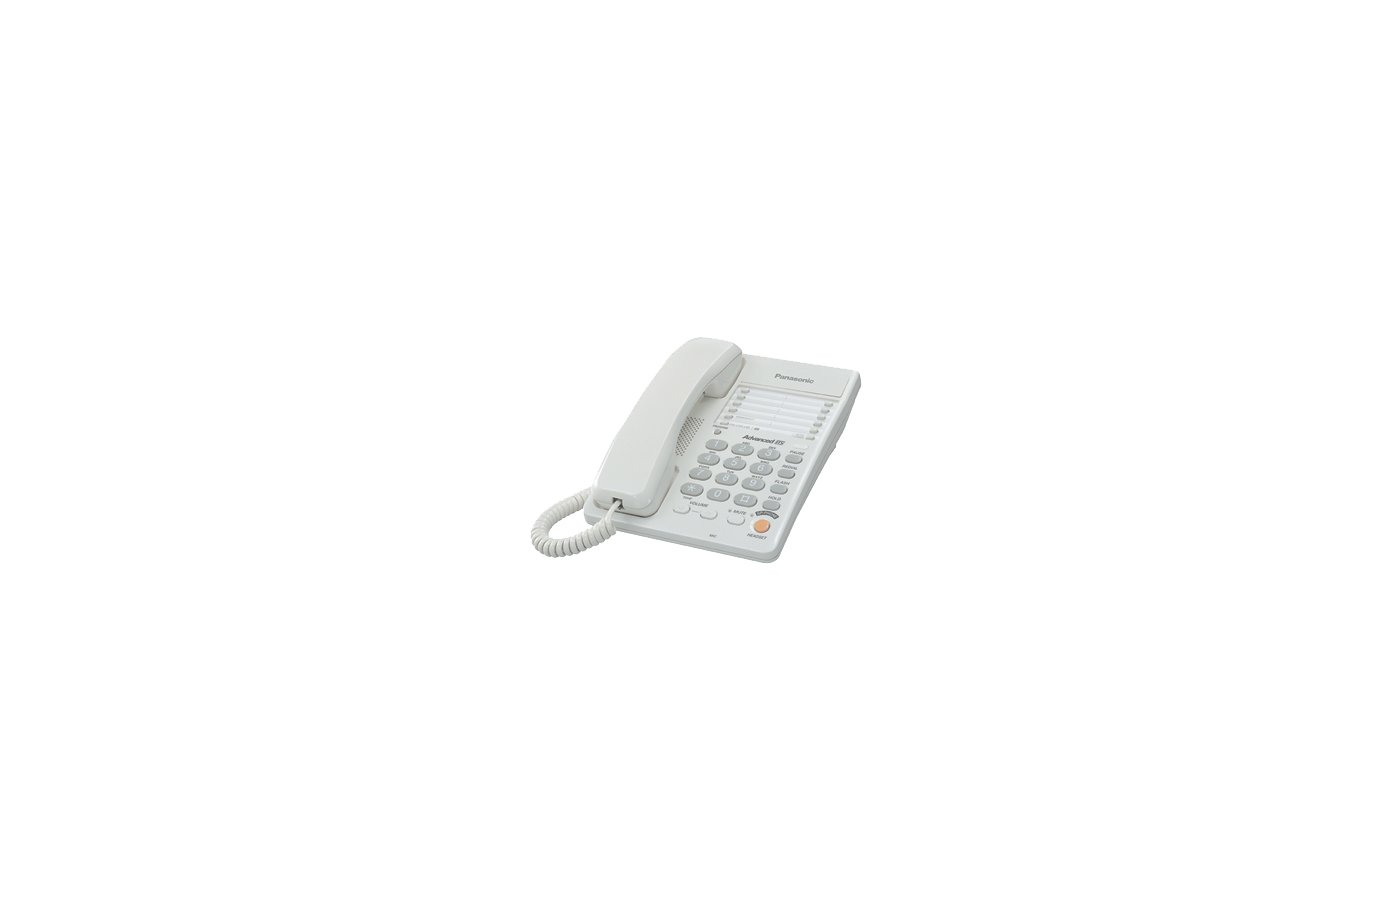 Проводной телефон PANASONIC KX-TS 2363 RUW